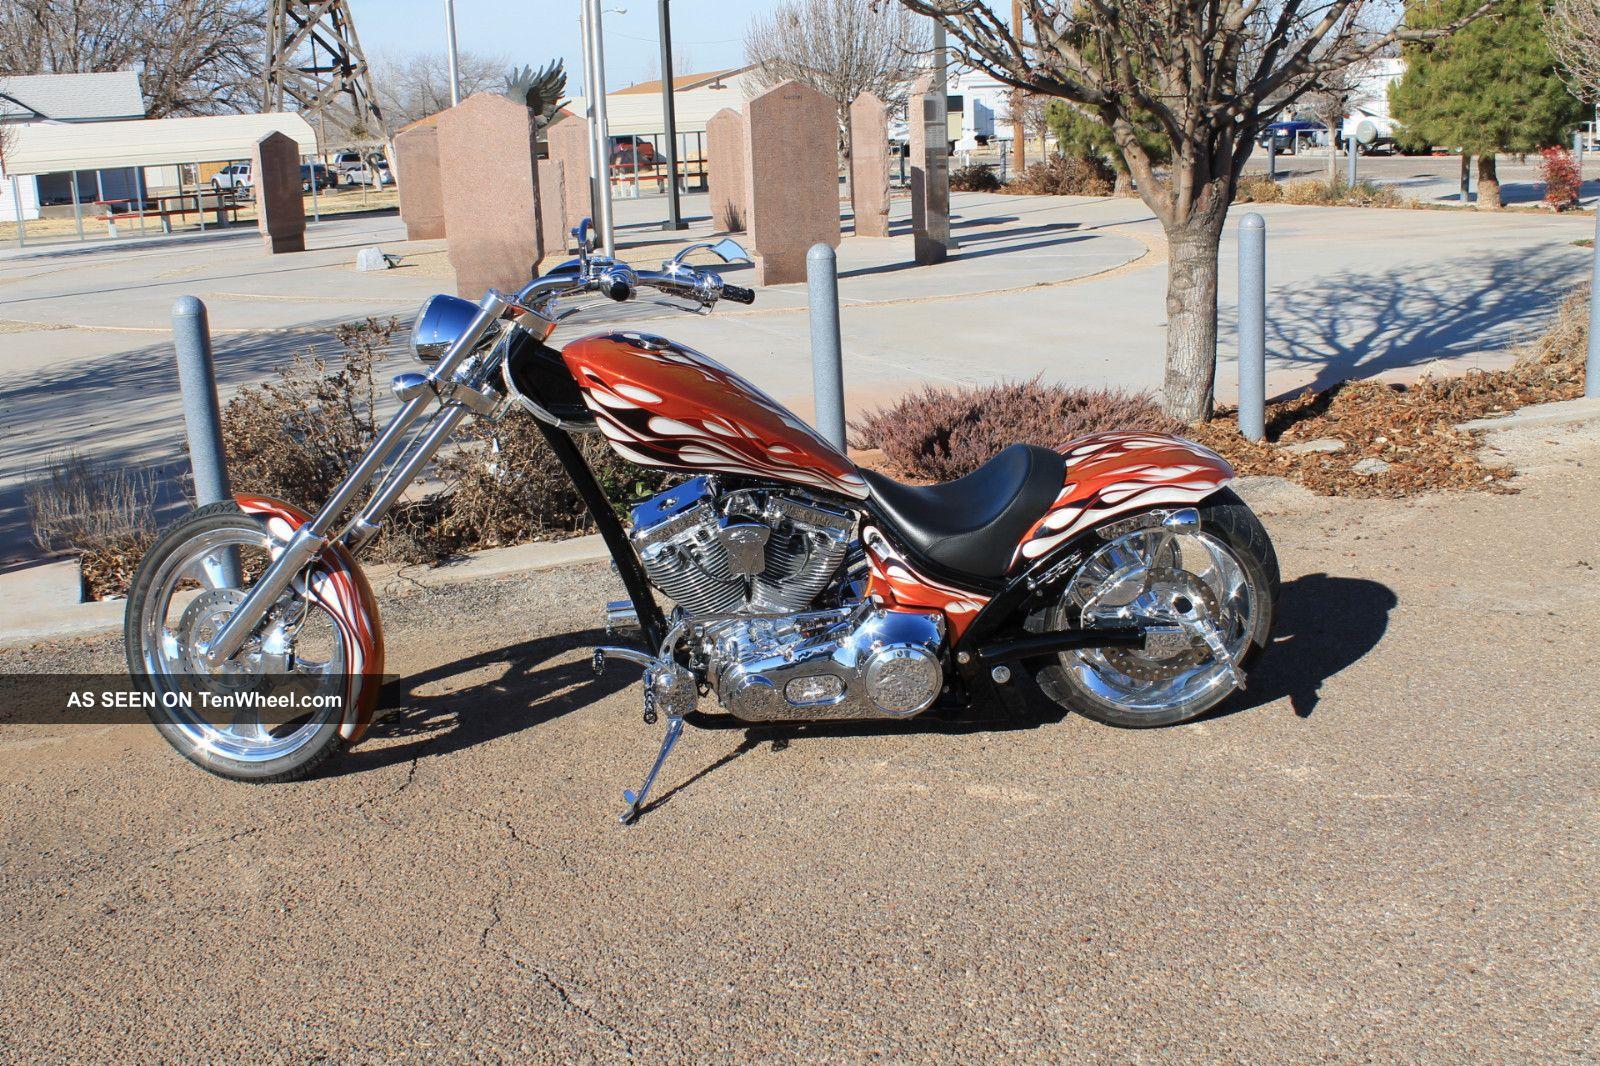 2008 American Ironhorse Texas Chopper